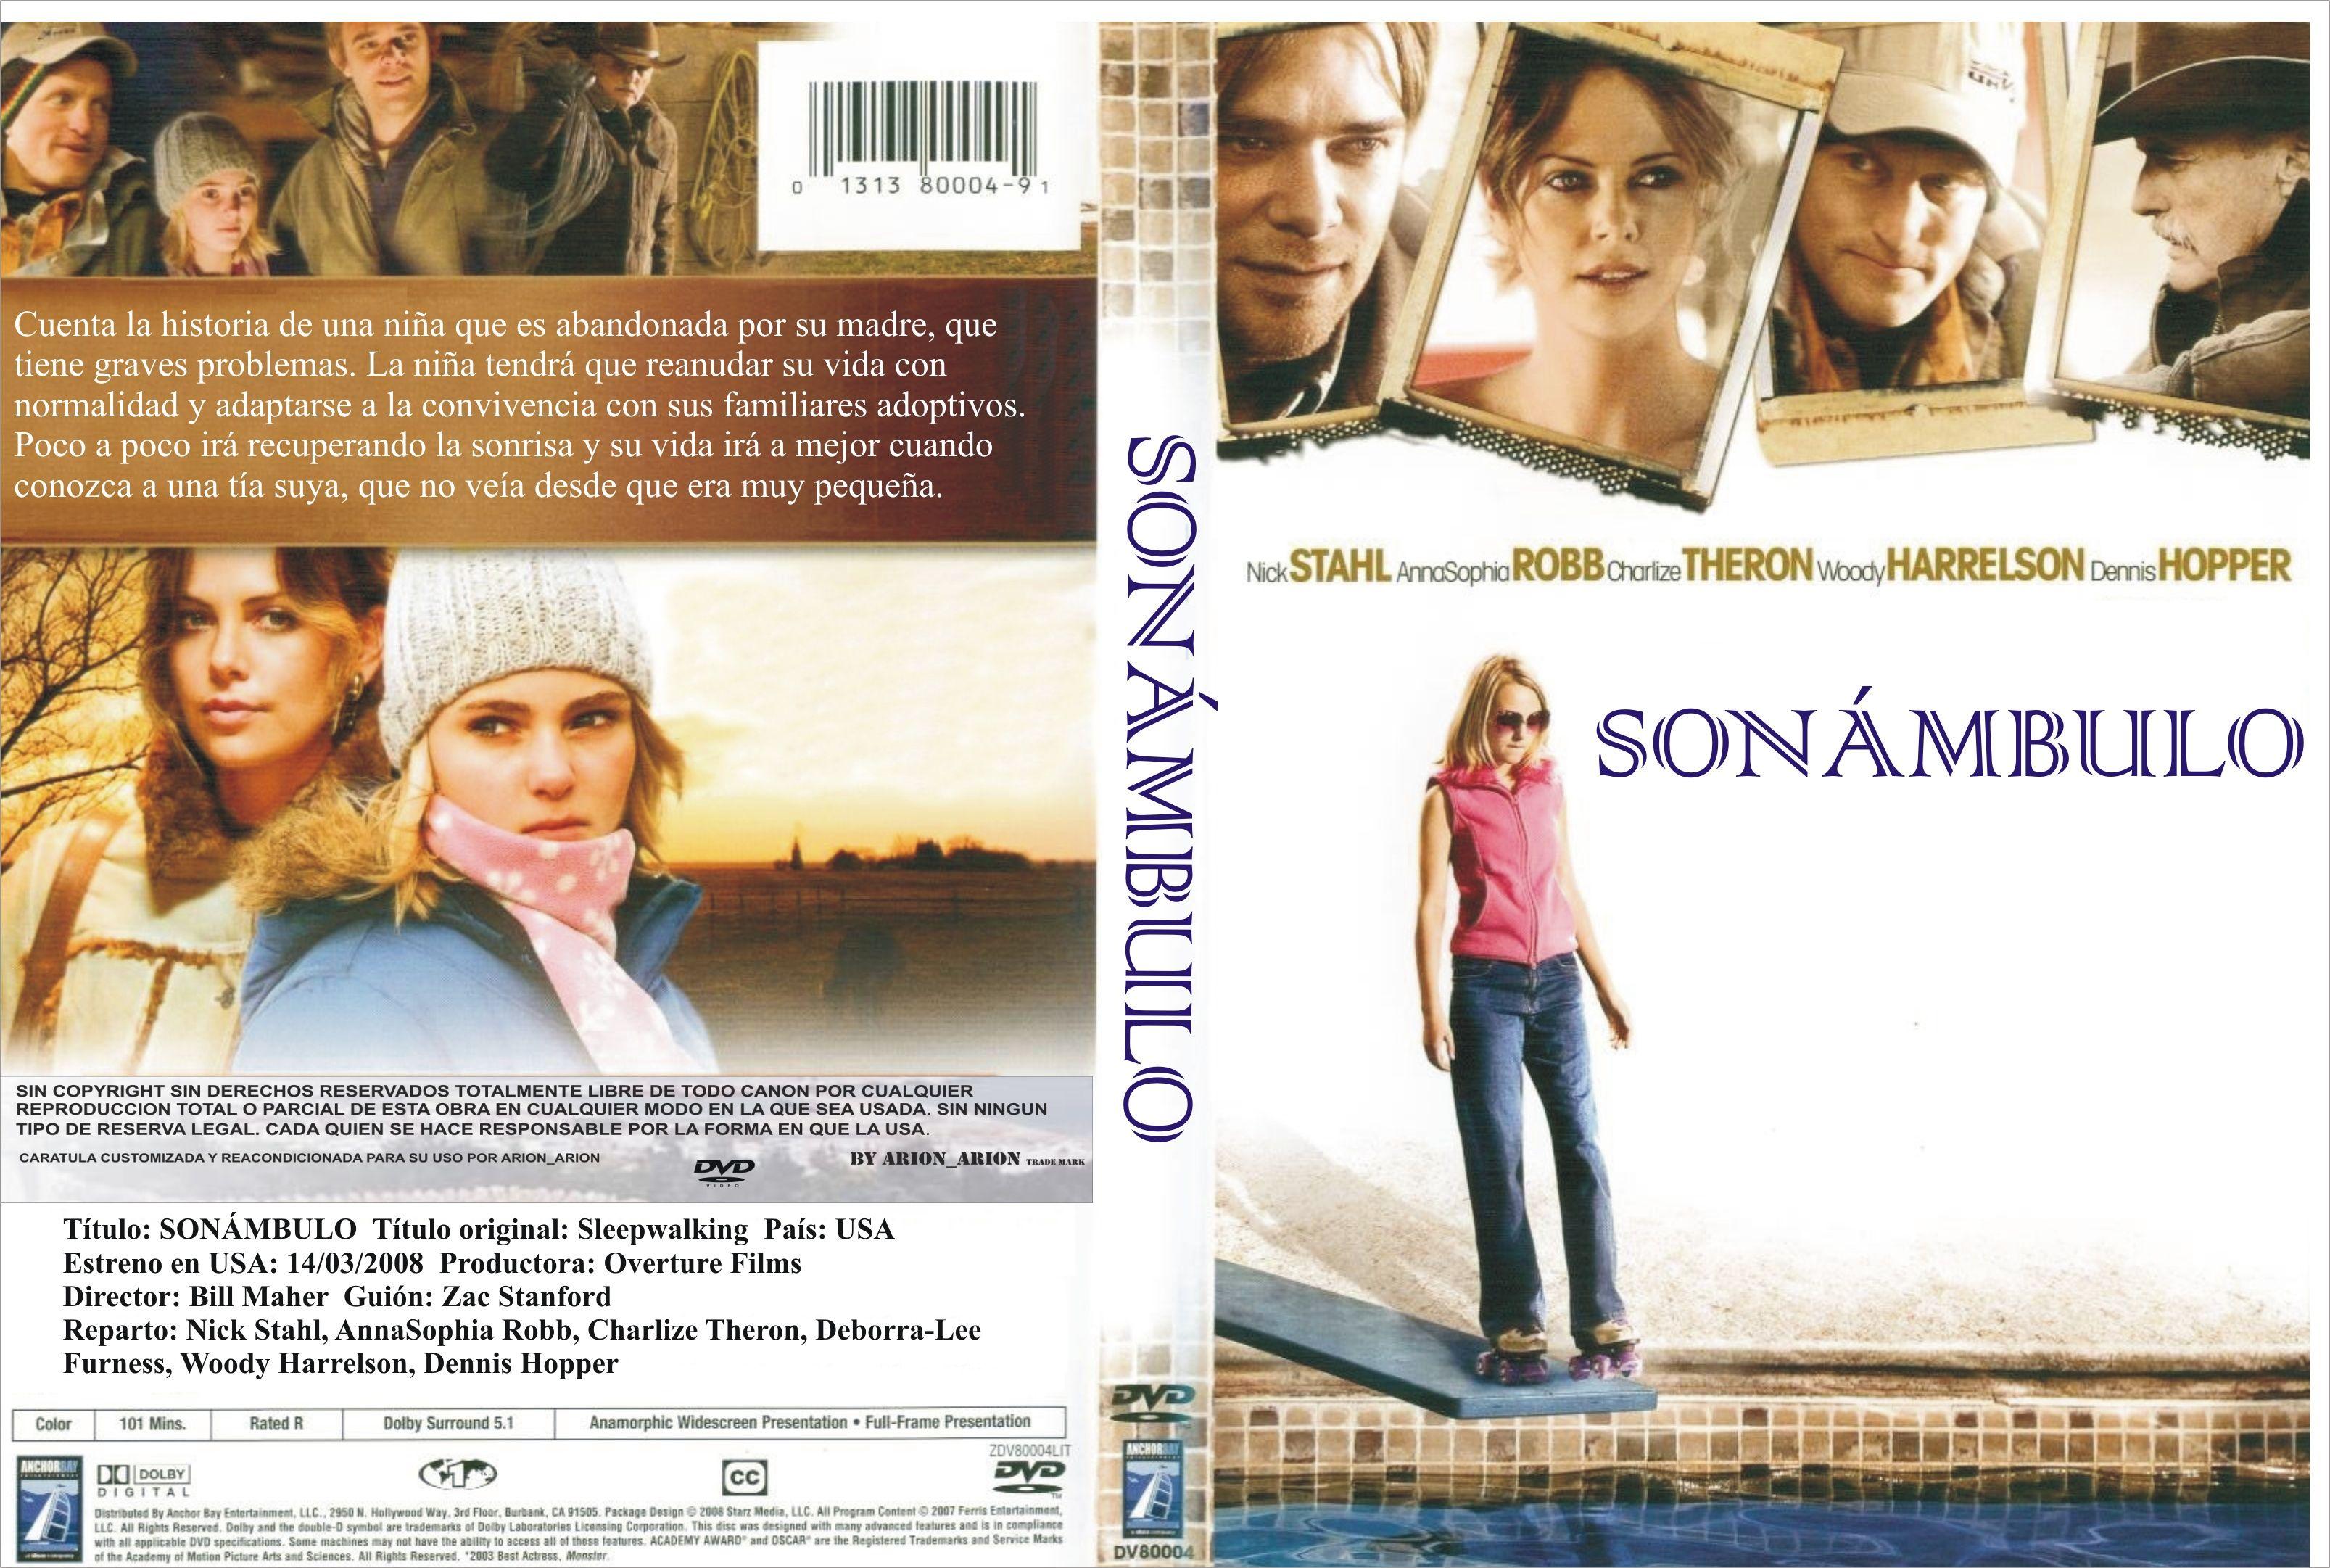 Sonambulo 2008 Custom Por Arion Arion – dvd | infi2011